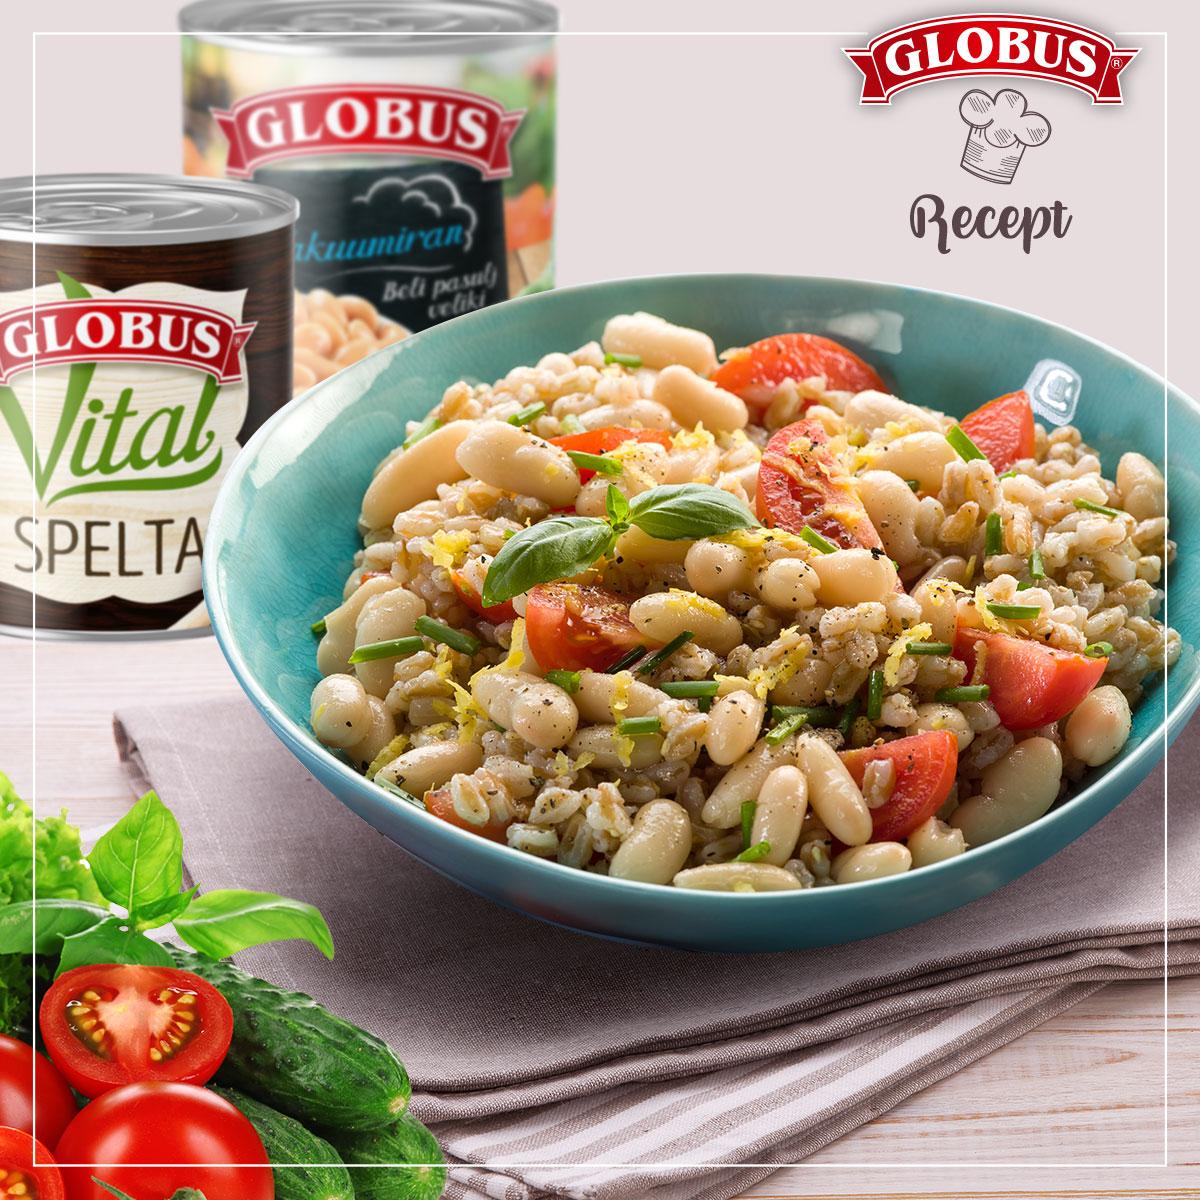 Salata sa speltom, pasuljem, čeri paradajzom i krastavcem